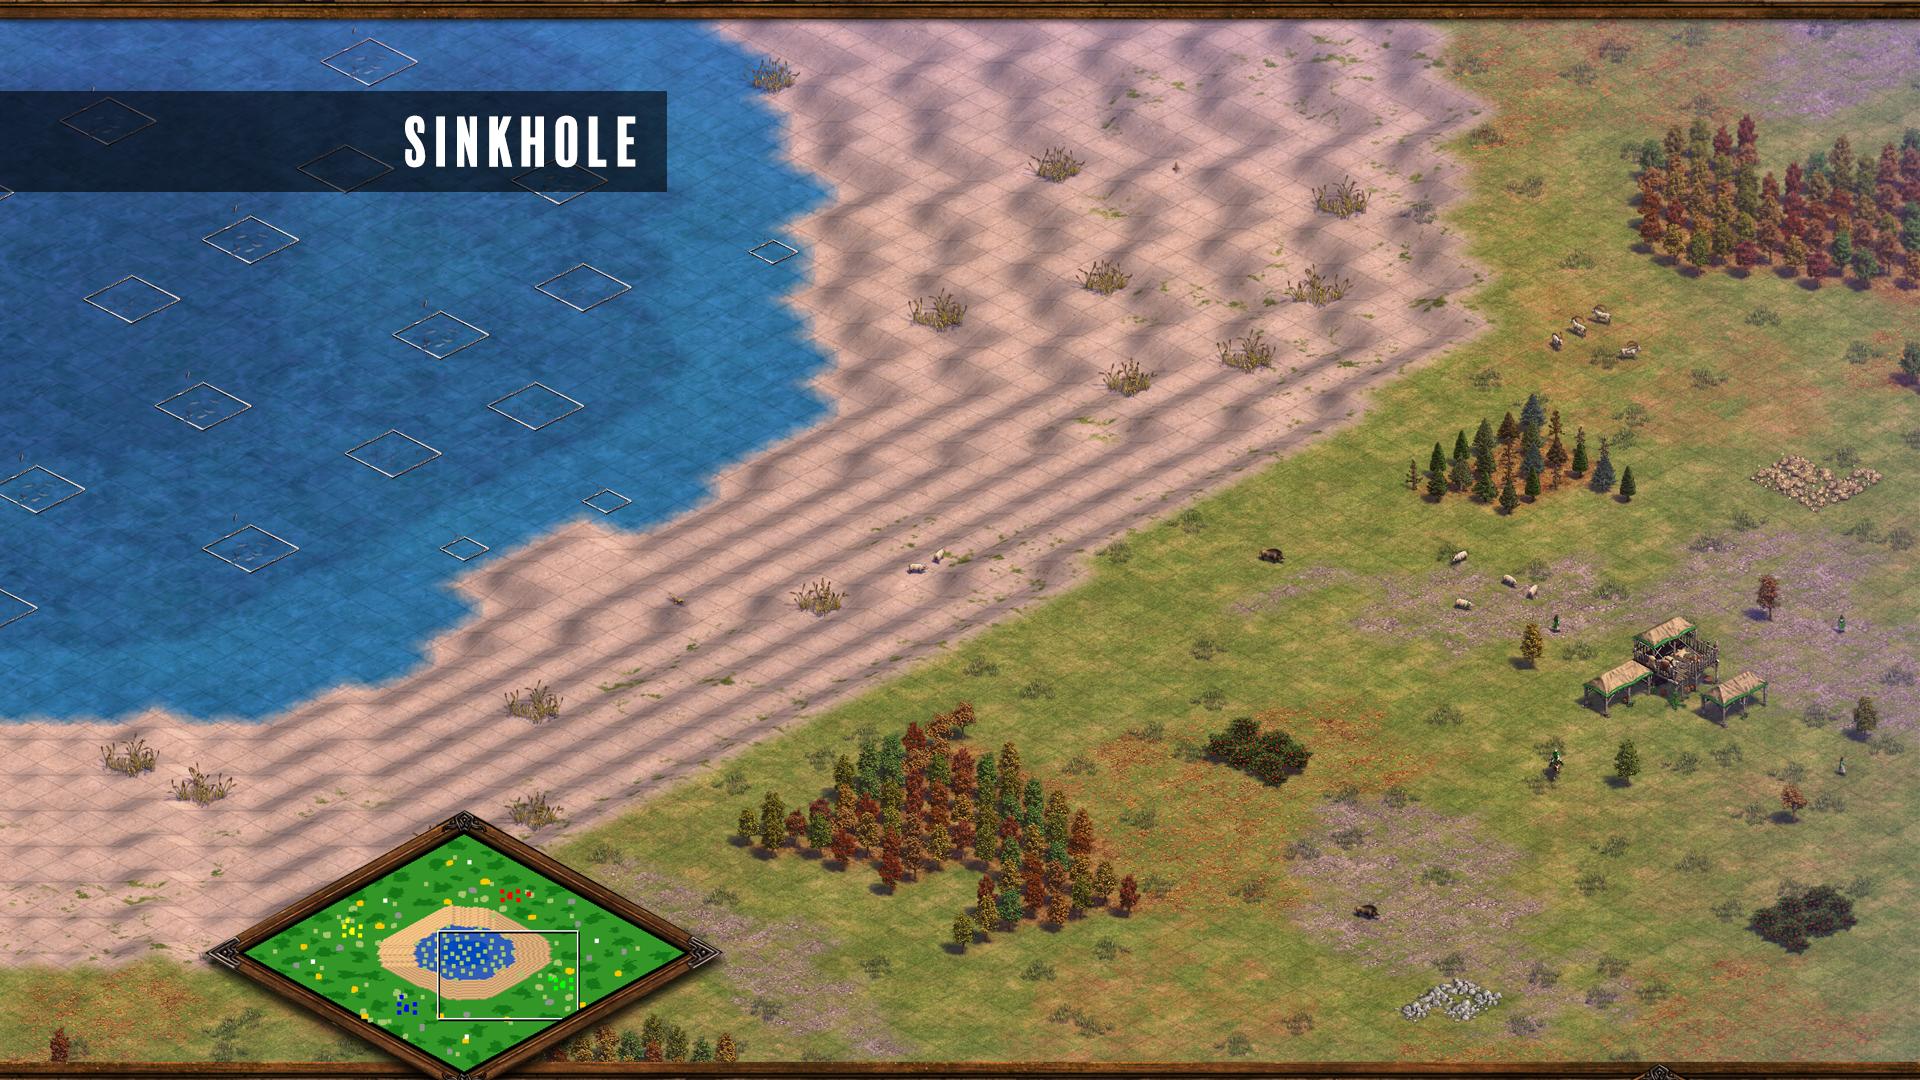 Sinkhole.png